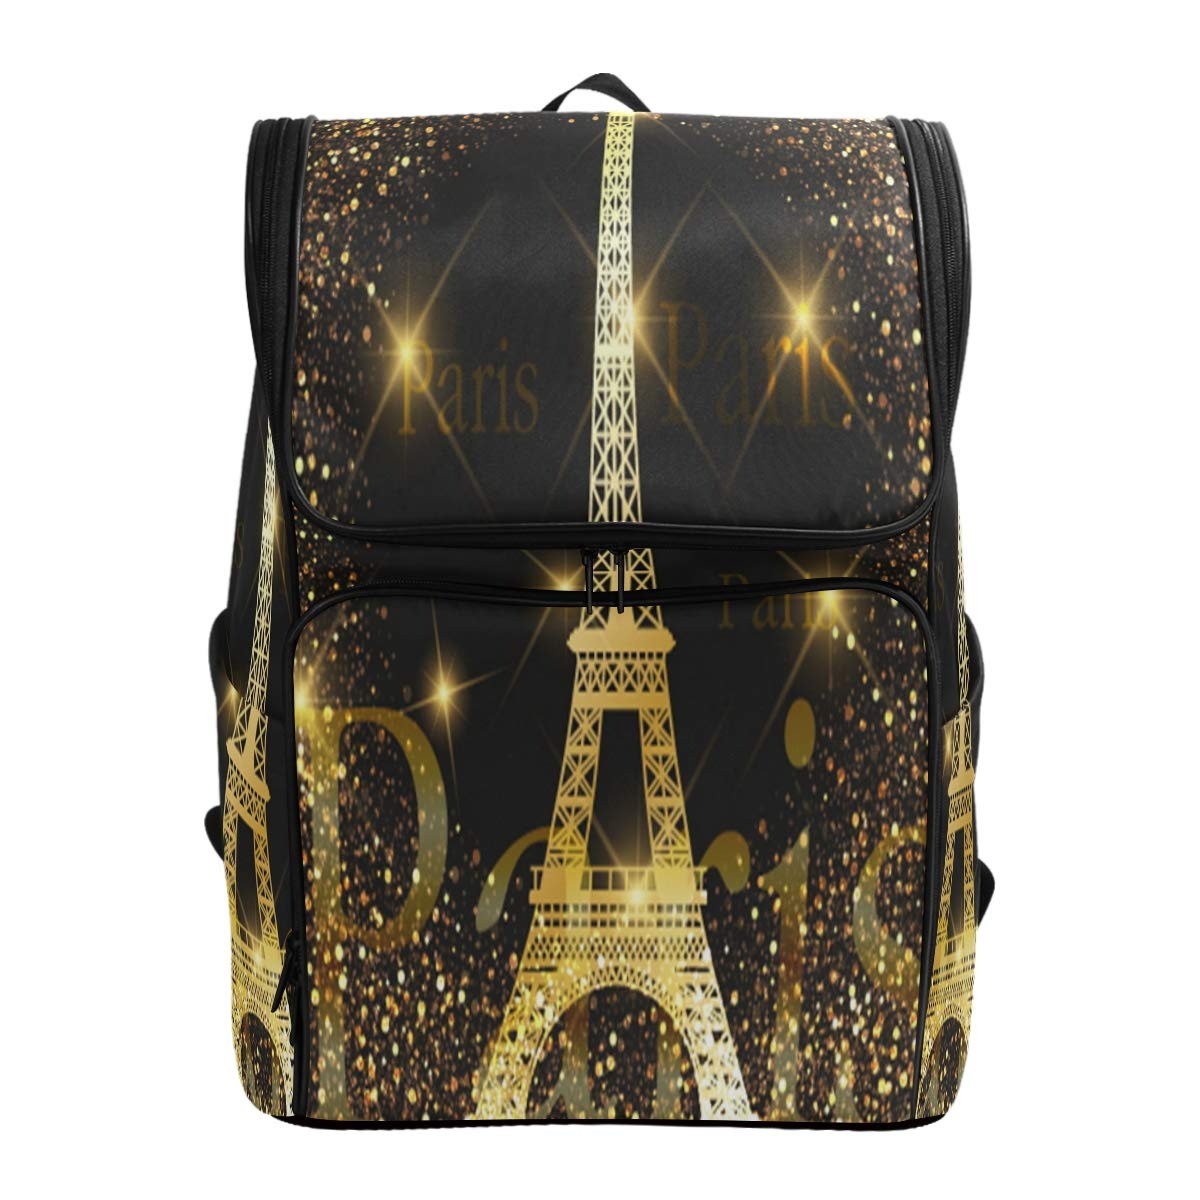 479b9c5ed0ab Amazon.com: Naanle Chic Beautiful Fireworks Paris Golden Eiffel ...